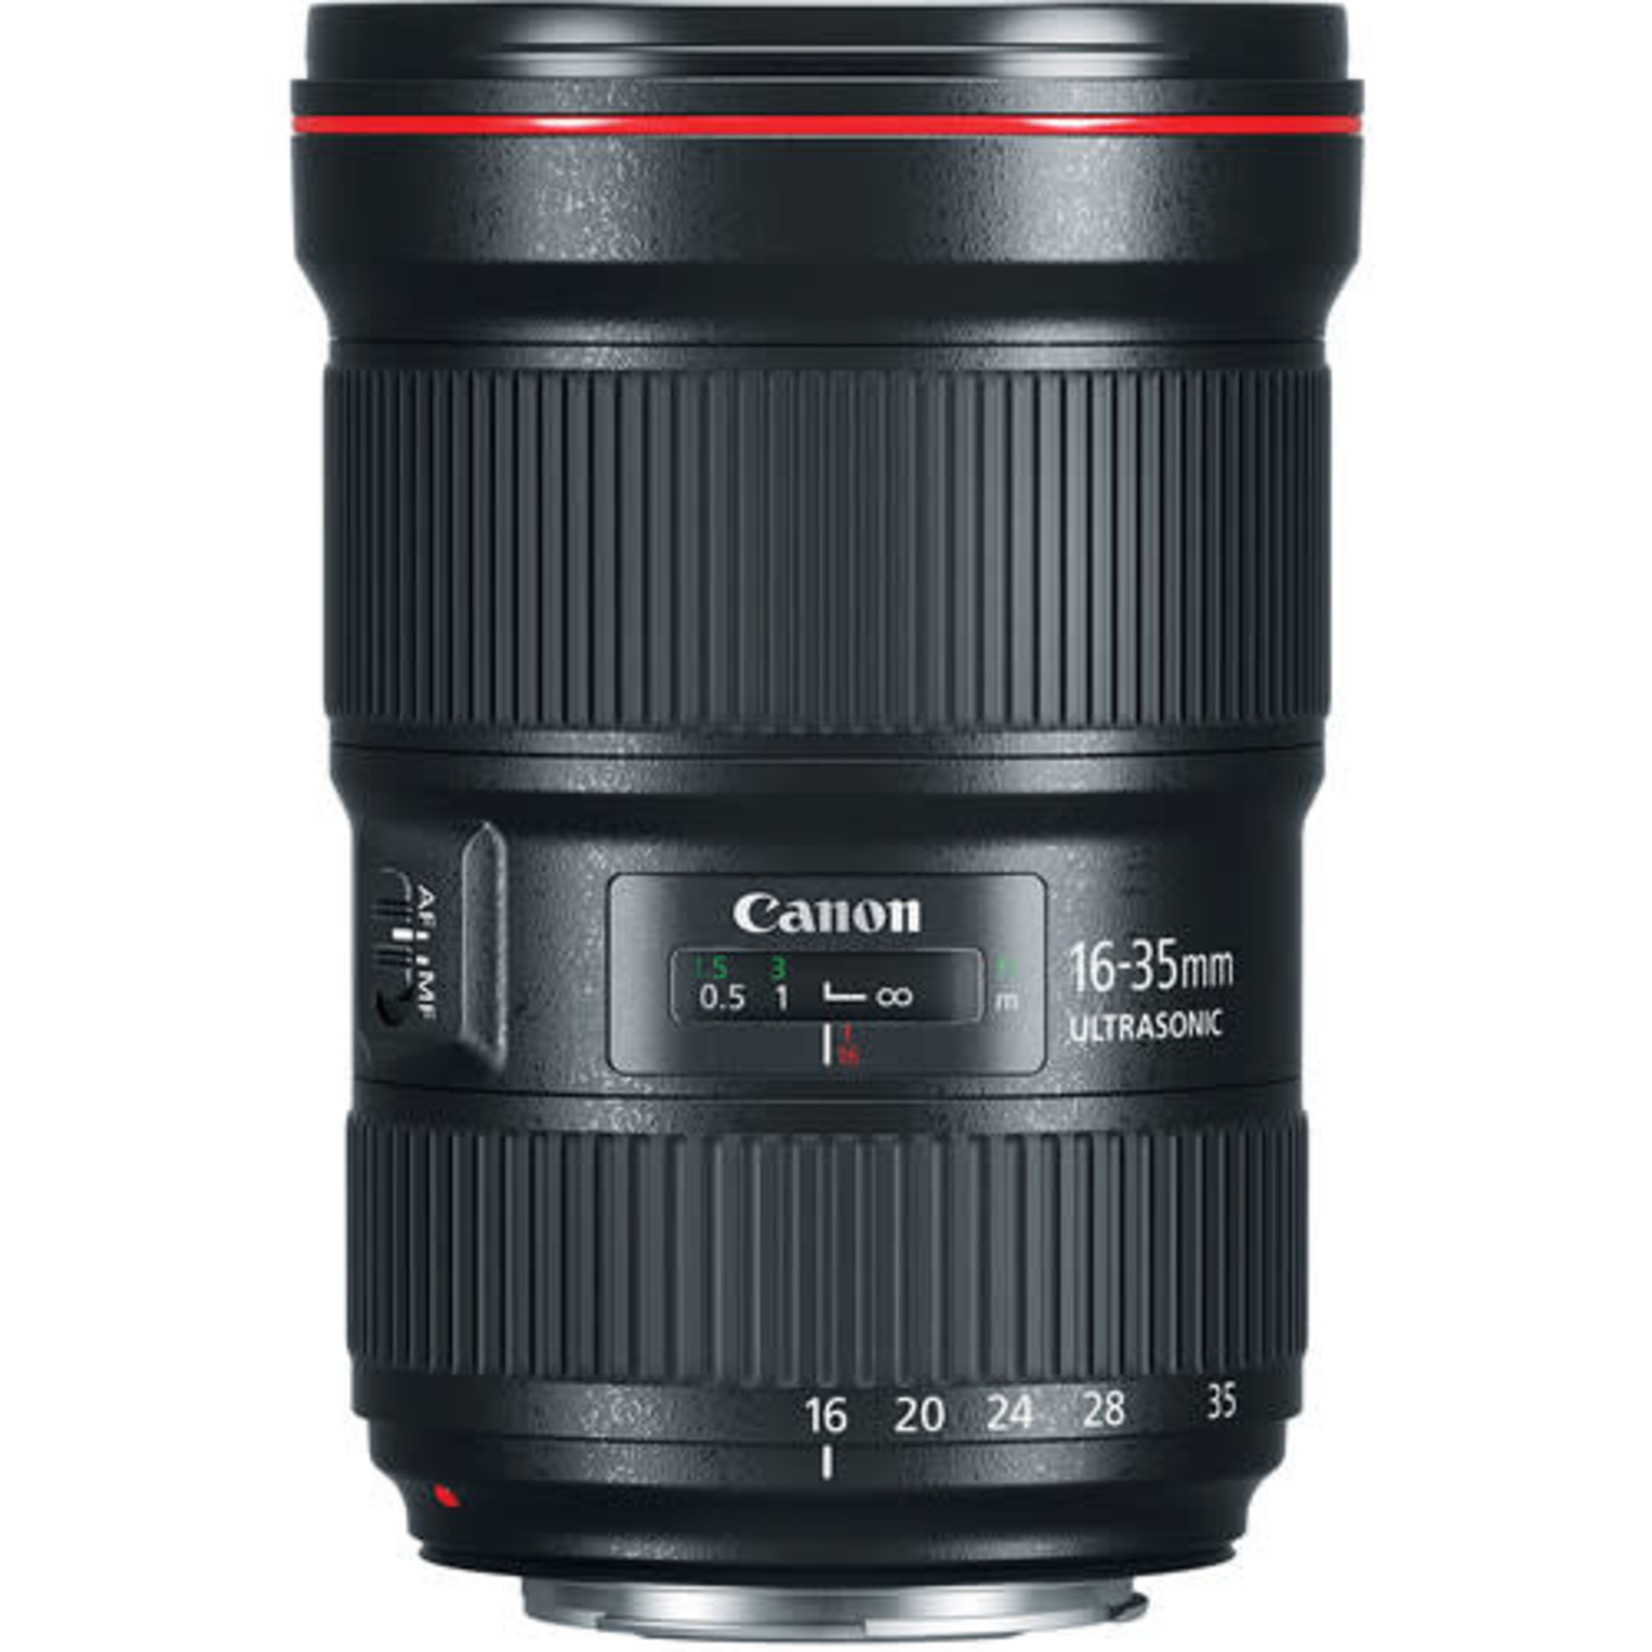 Canon Canon EF 16-35mm f/2.8L III USM Lens